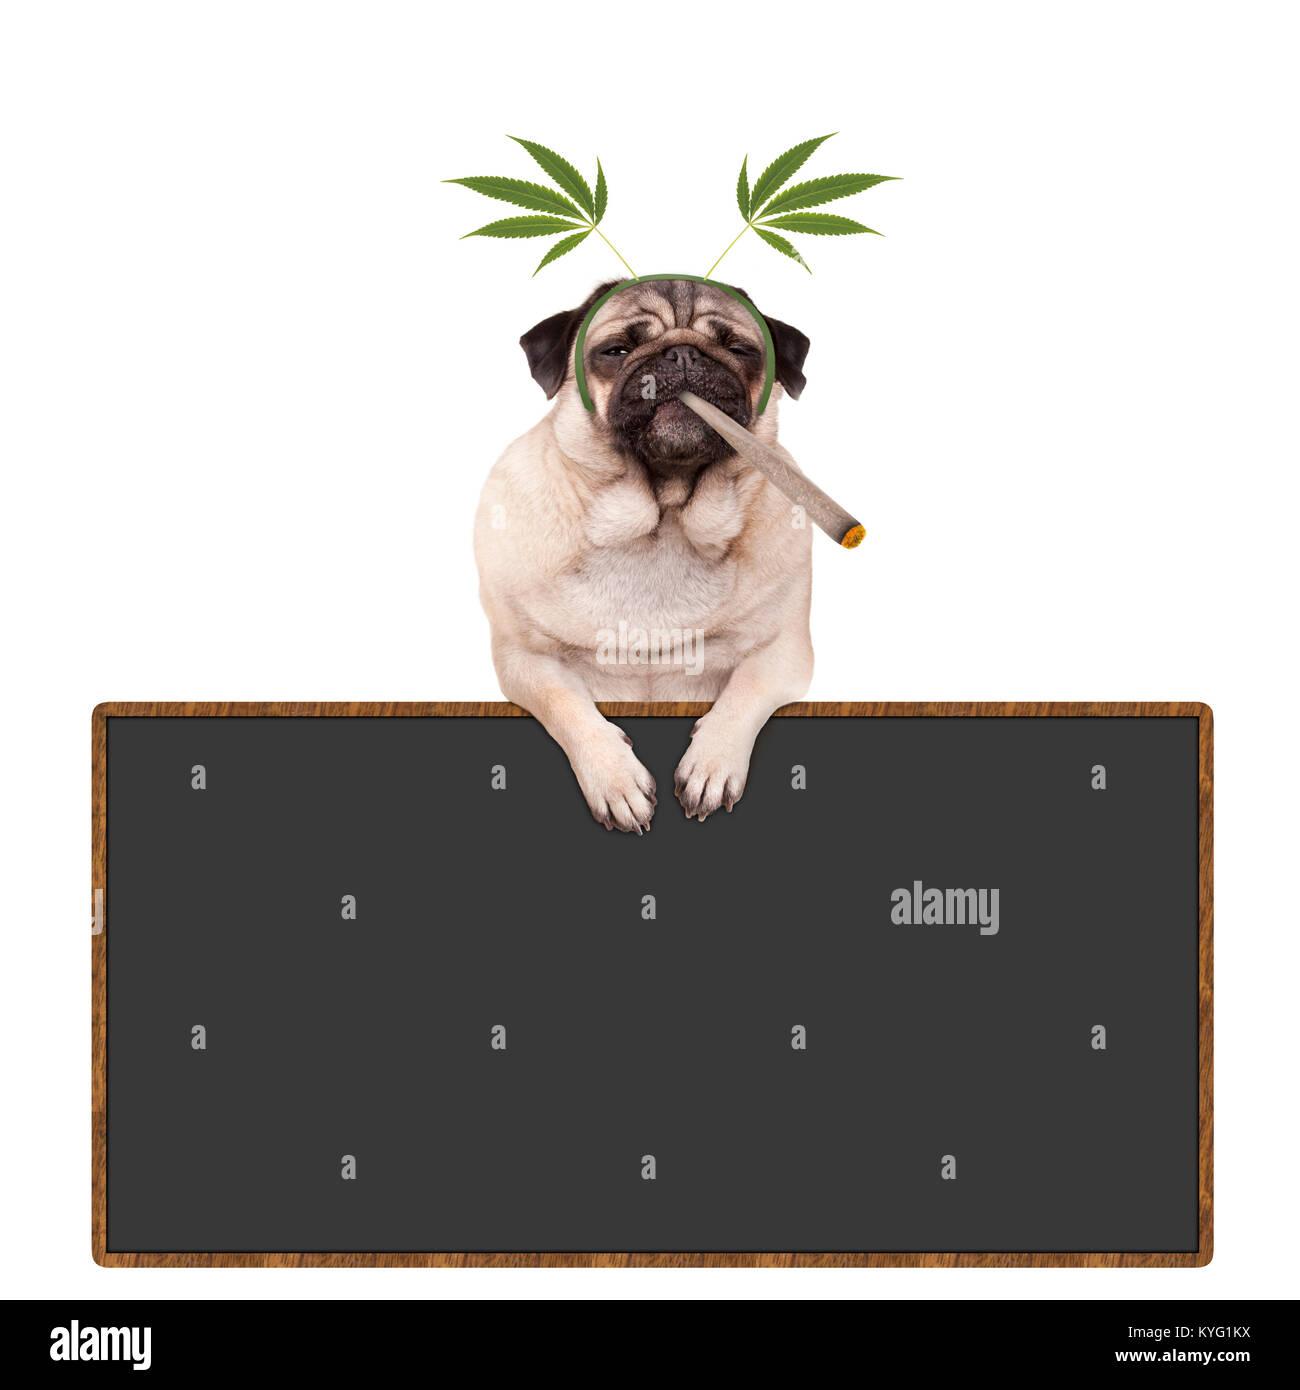 pug puppy dog being high, smoking marijuana weed joint, wearing hemp leaves diadem, hanging on blackboard sign, - Stock Image